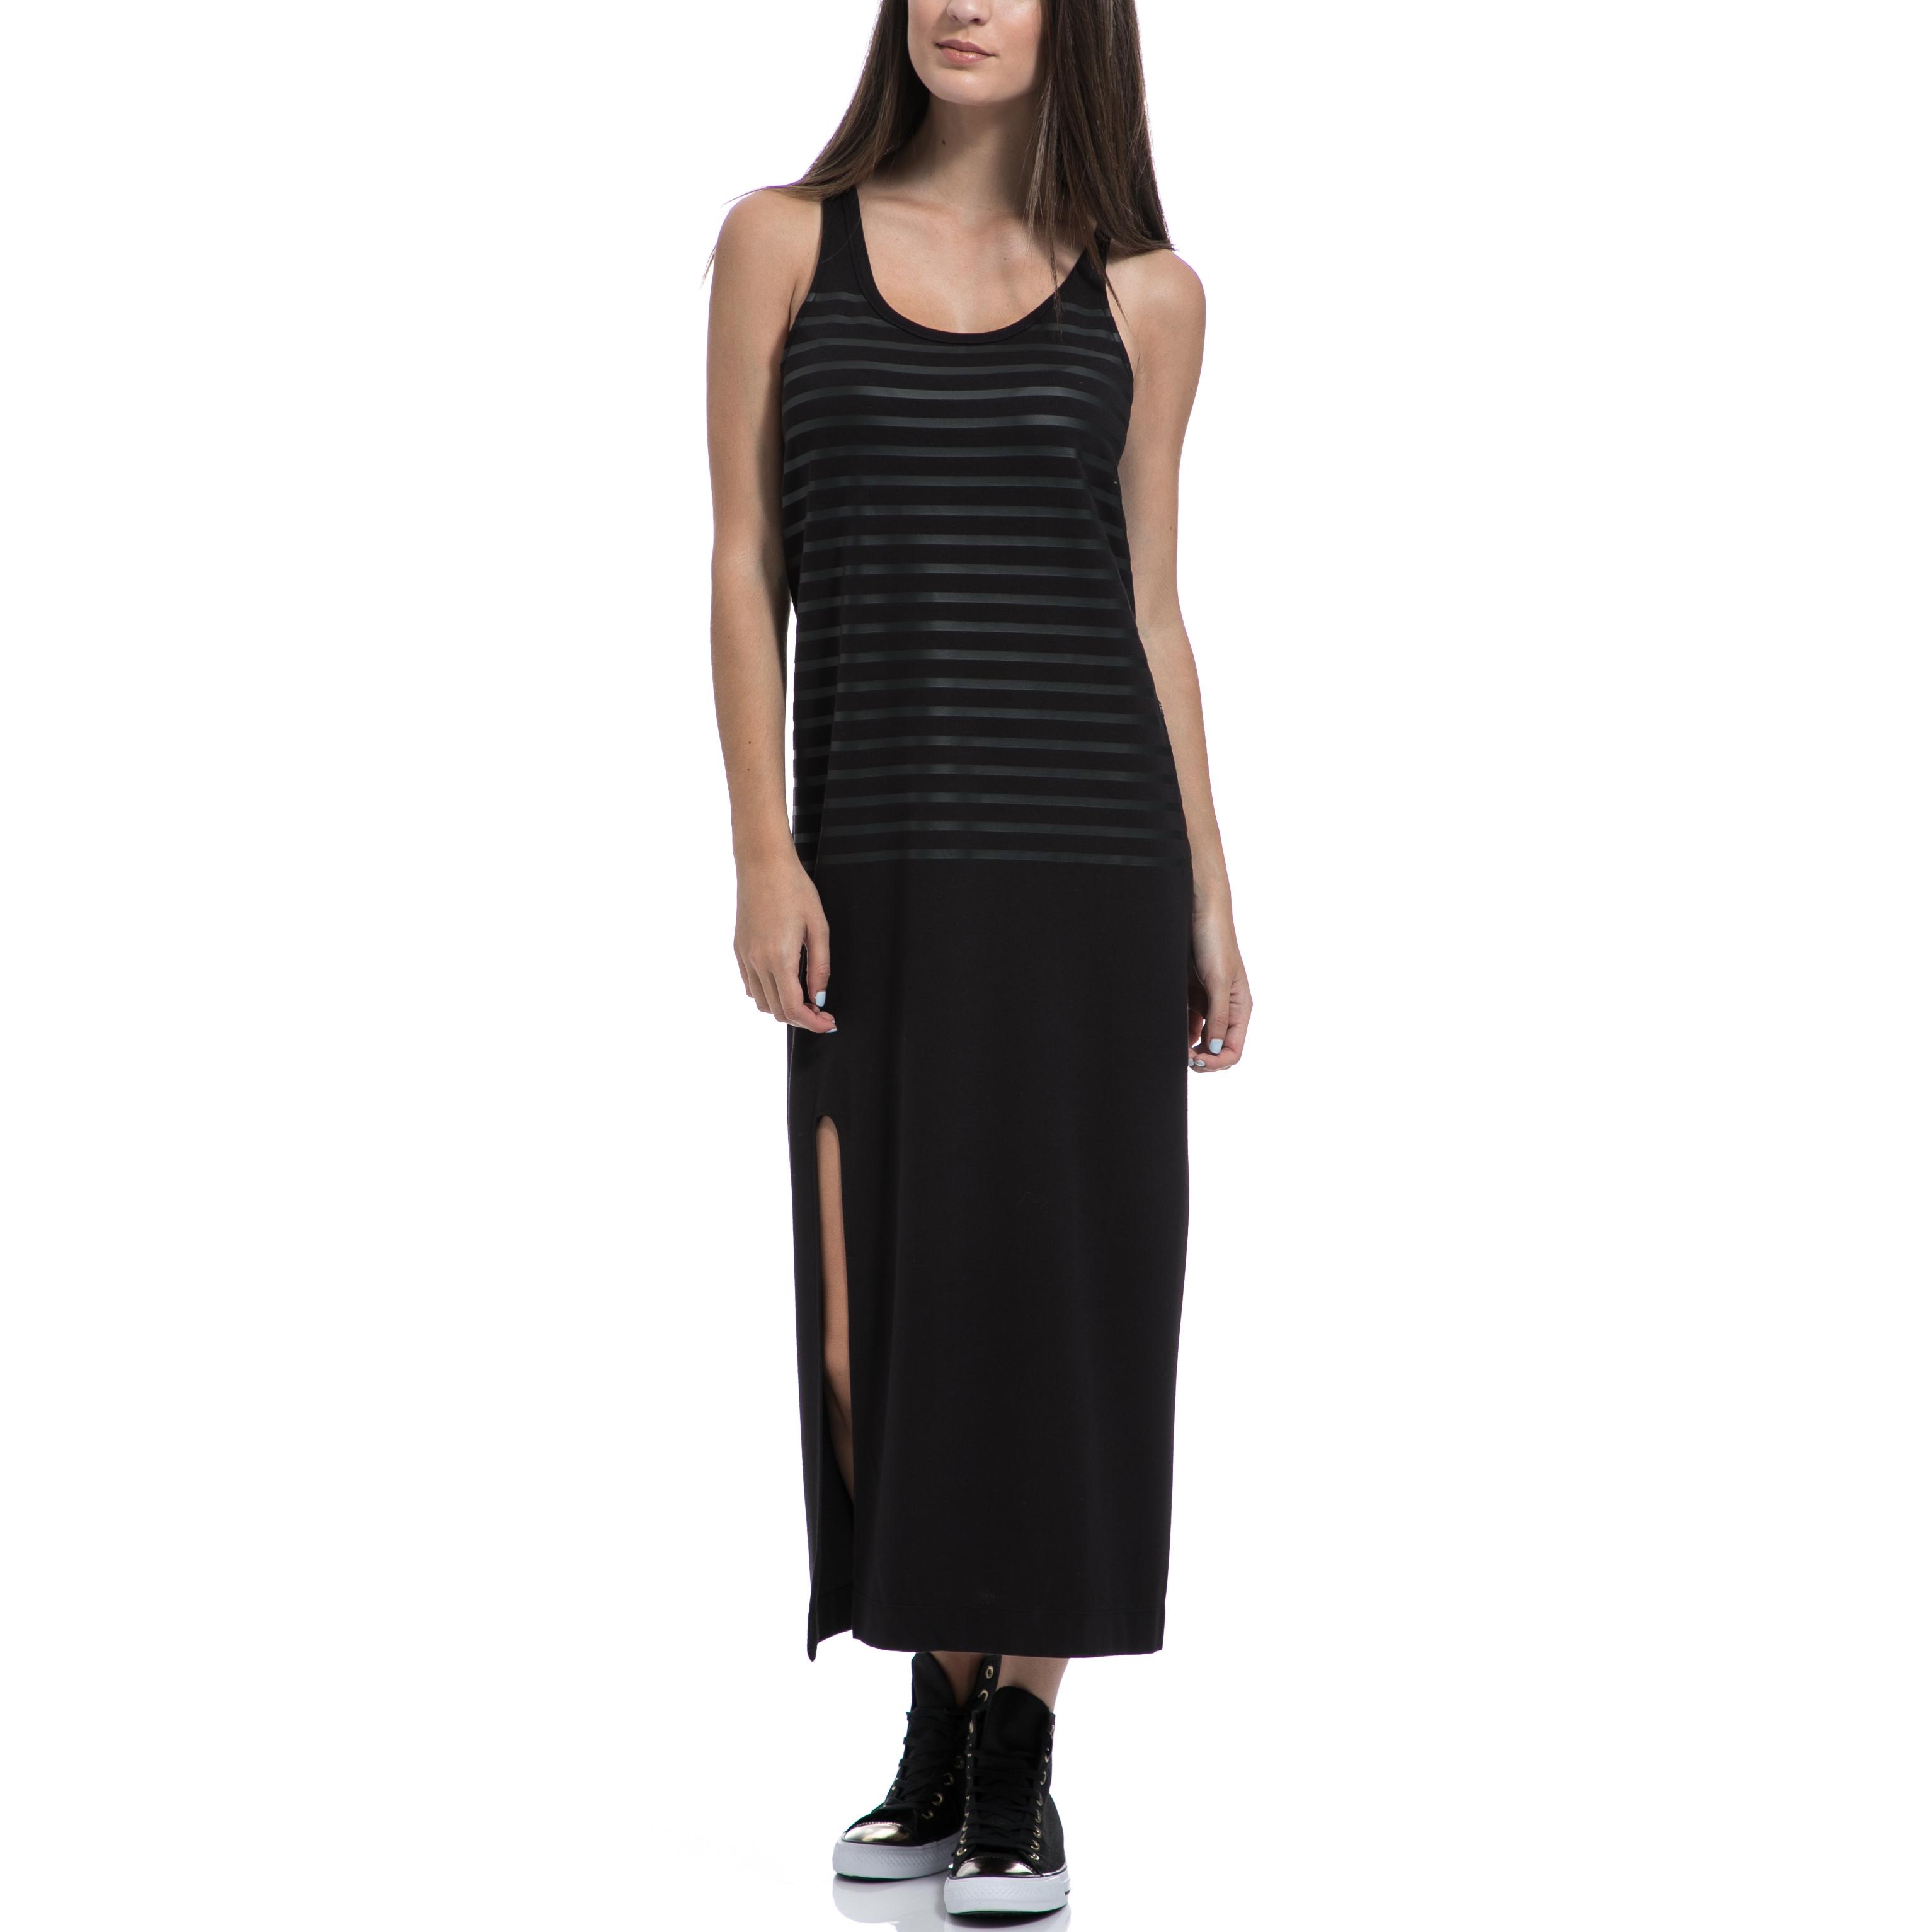 G-STAR RAW - Γυναικείο φόρεμα G-STAR RAW μαύρο γυναικεία ρούχα φορέματα μάξι